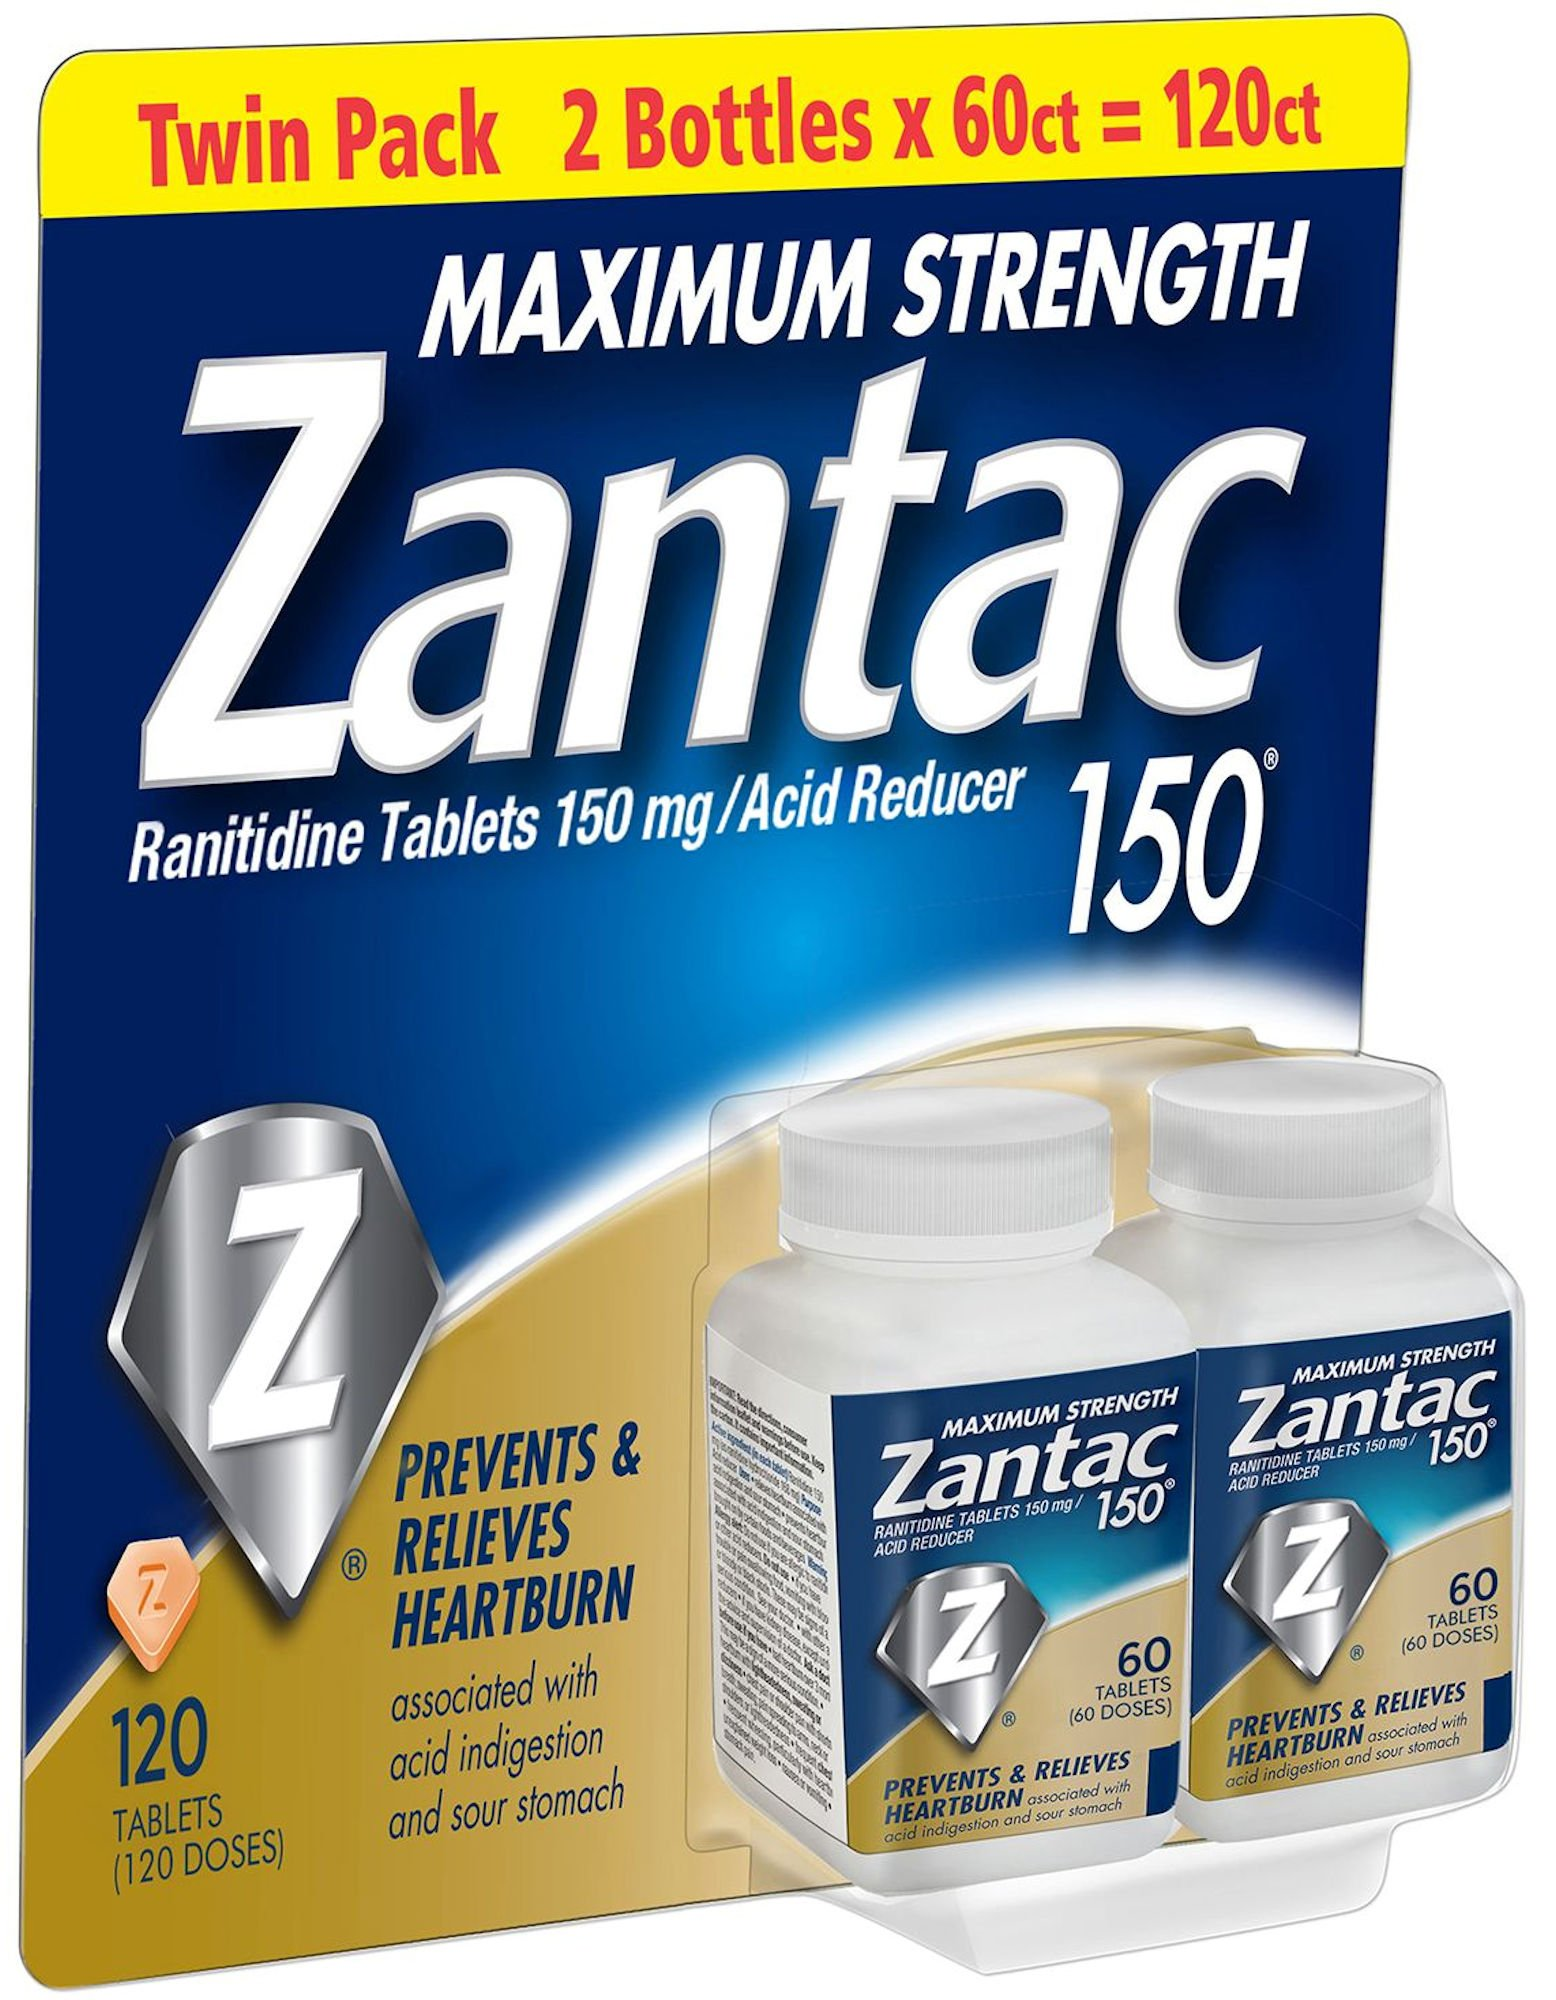 Zantac 150 Maximum Strength Tablets, Regular, 120 Count